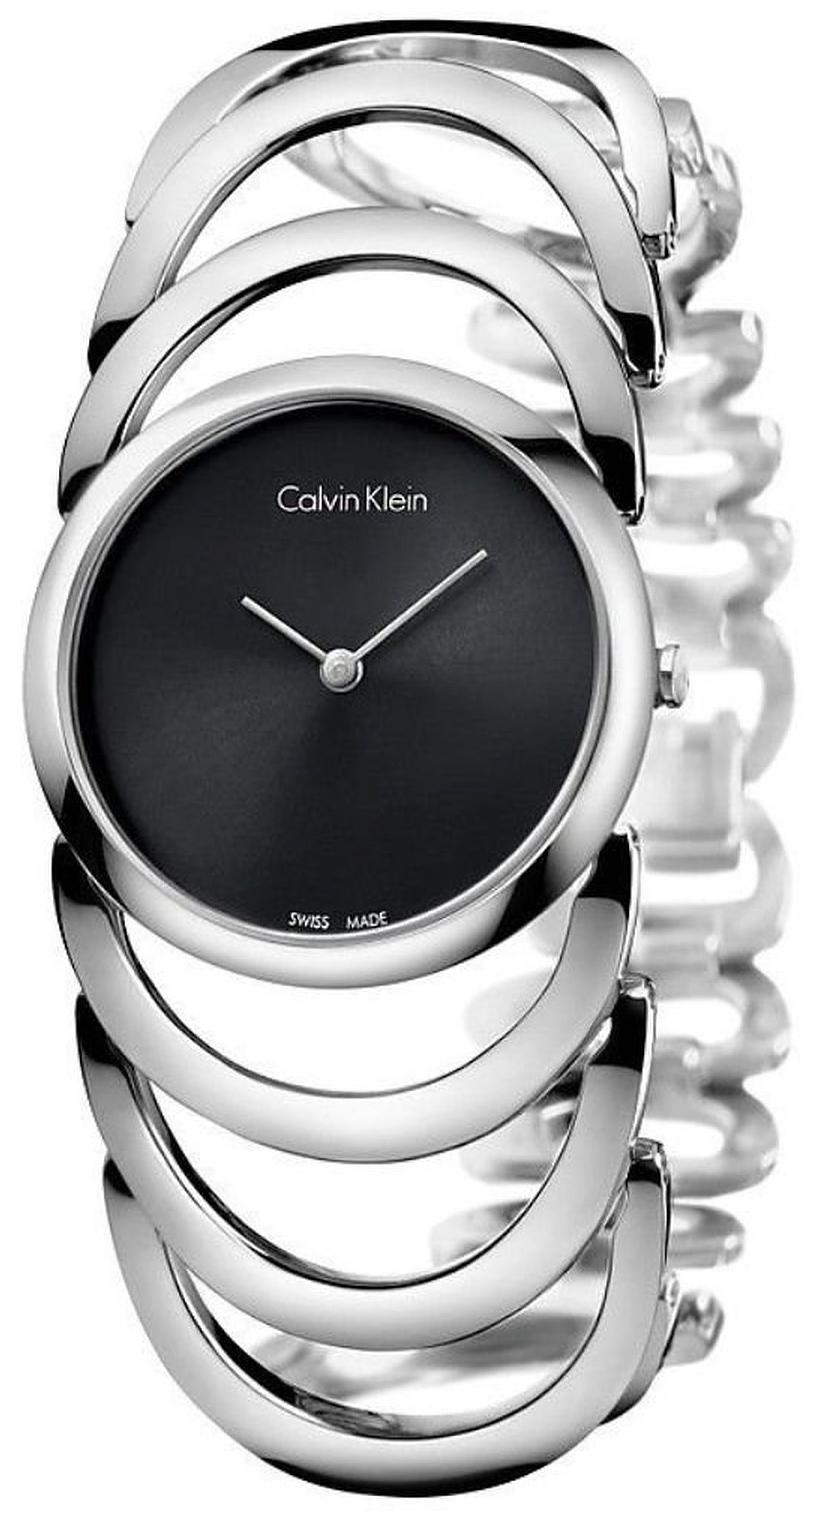 Calvin Klein Body Dameklokke K4G23121 Sort/Stål Ø30 mm - Calvin Klein